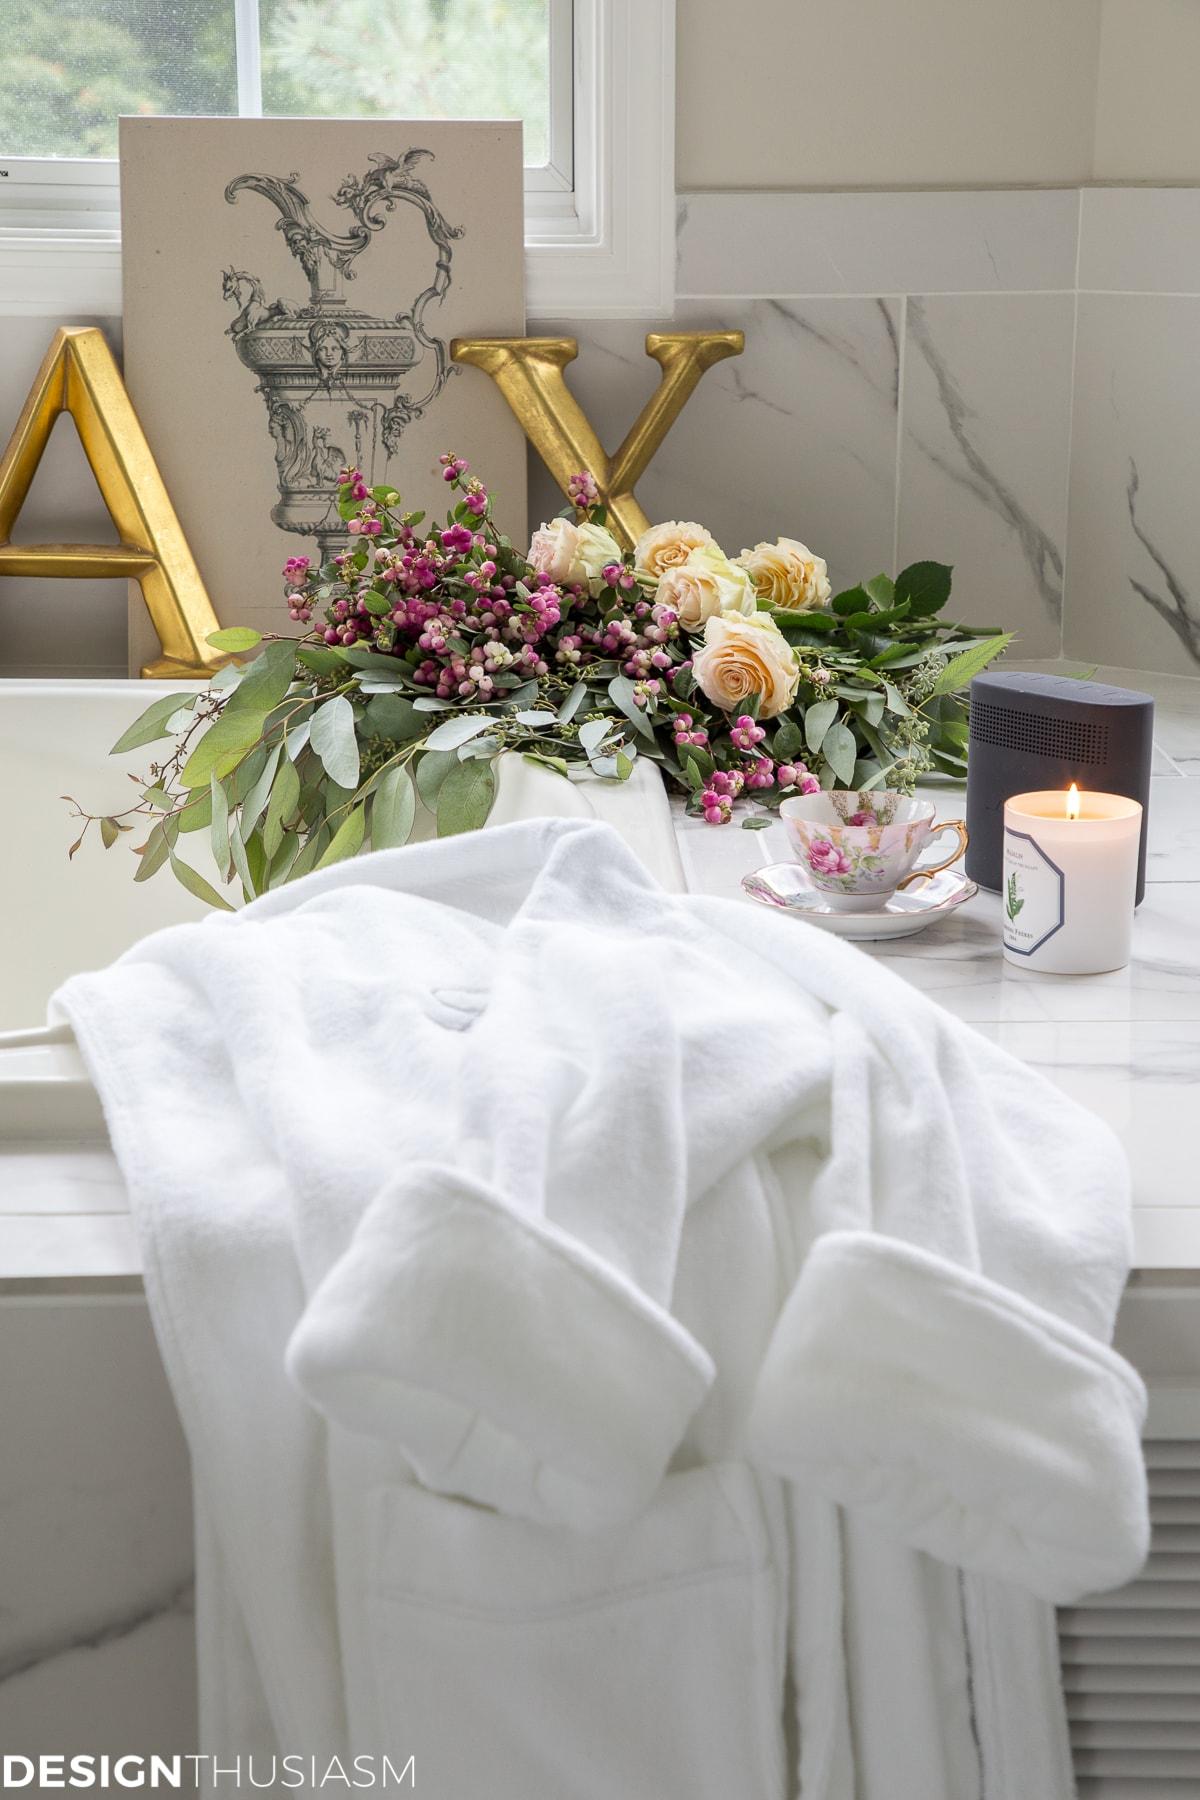 Home Bath Spa: 5 Affordable Ways to Indulge in a Luxury Bath